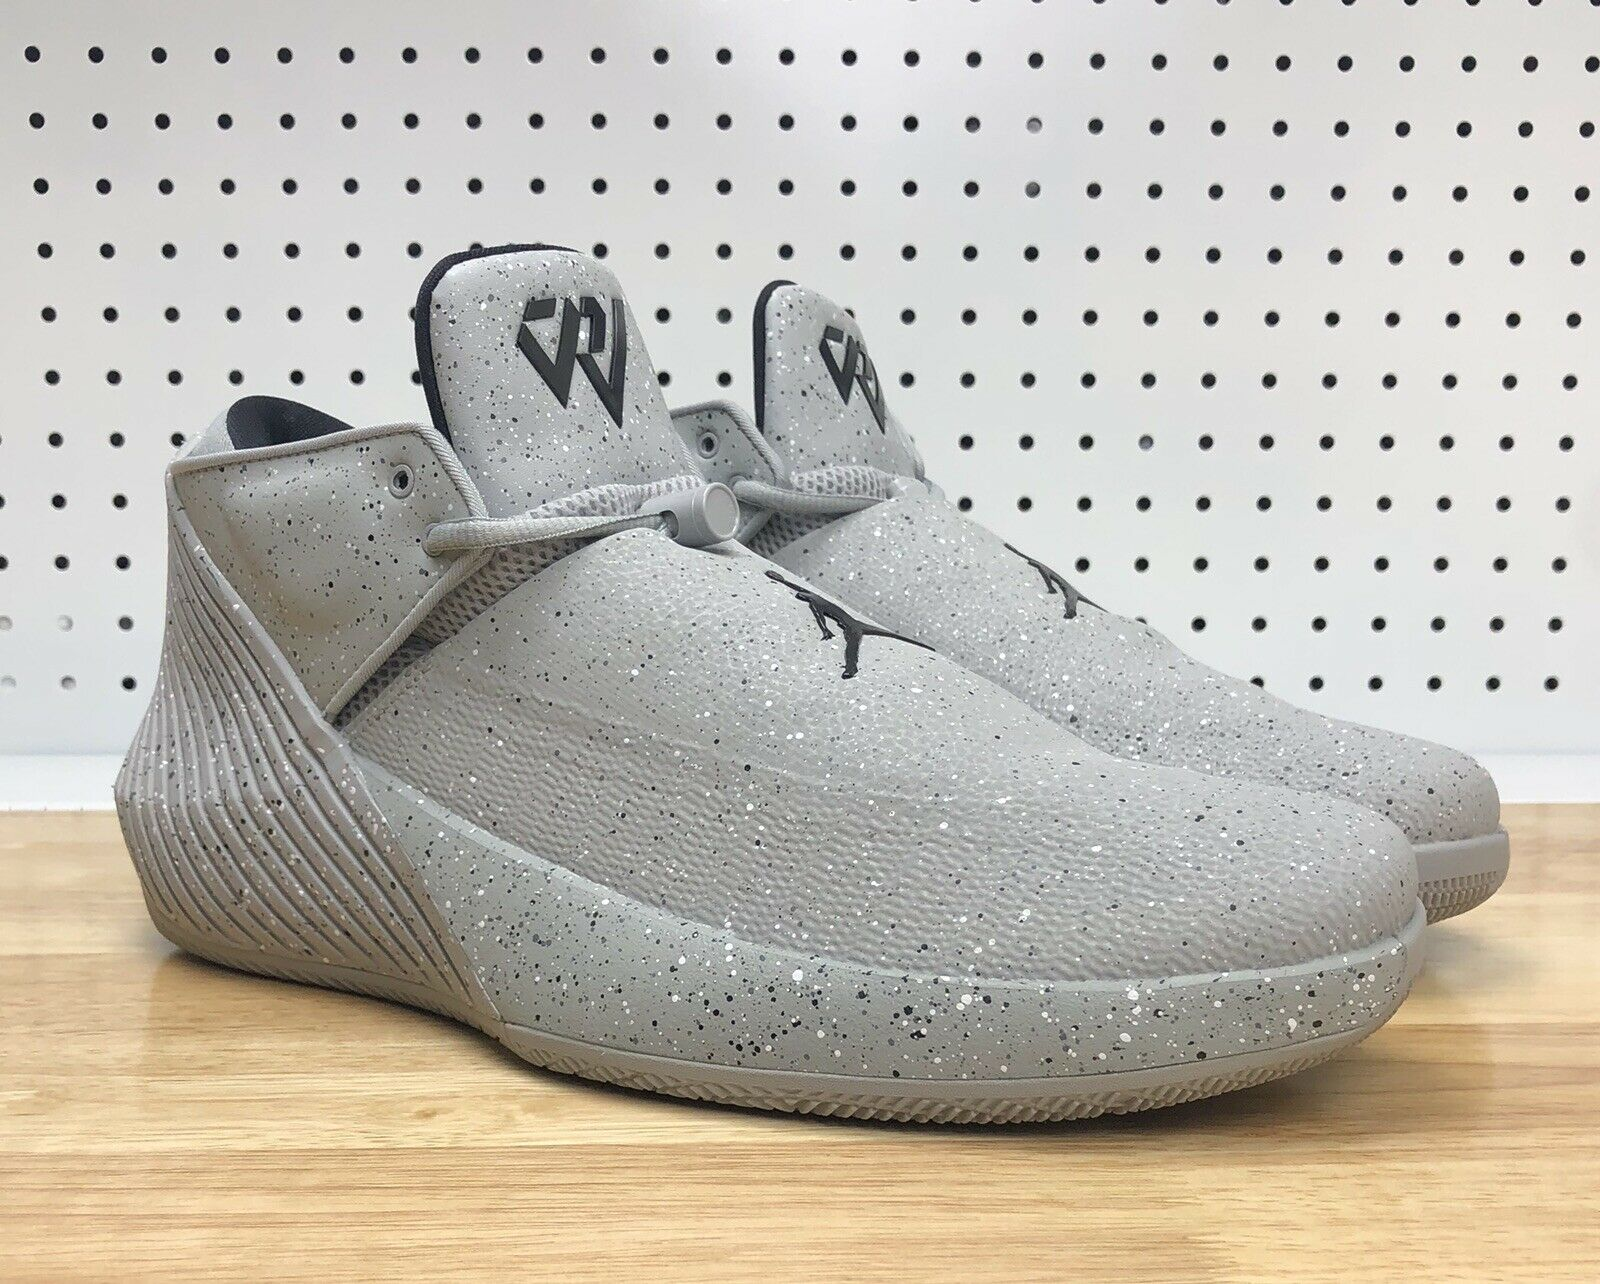 Nike Air Jordan Why Not ZerO.1 Low Cement Grey AR0043-002 Men's Sz 9.5 Westbrook